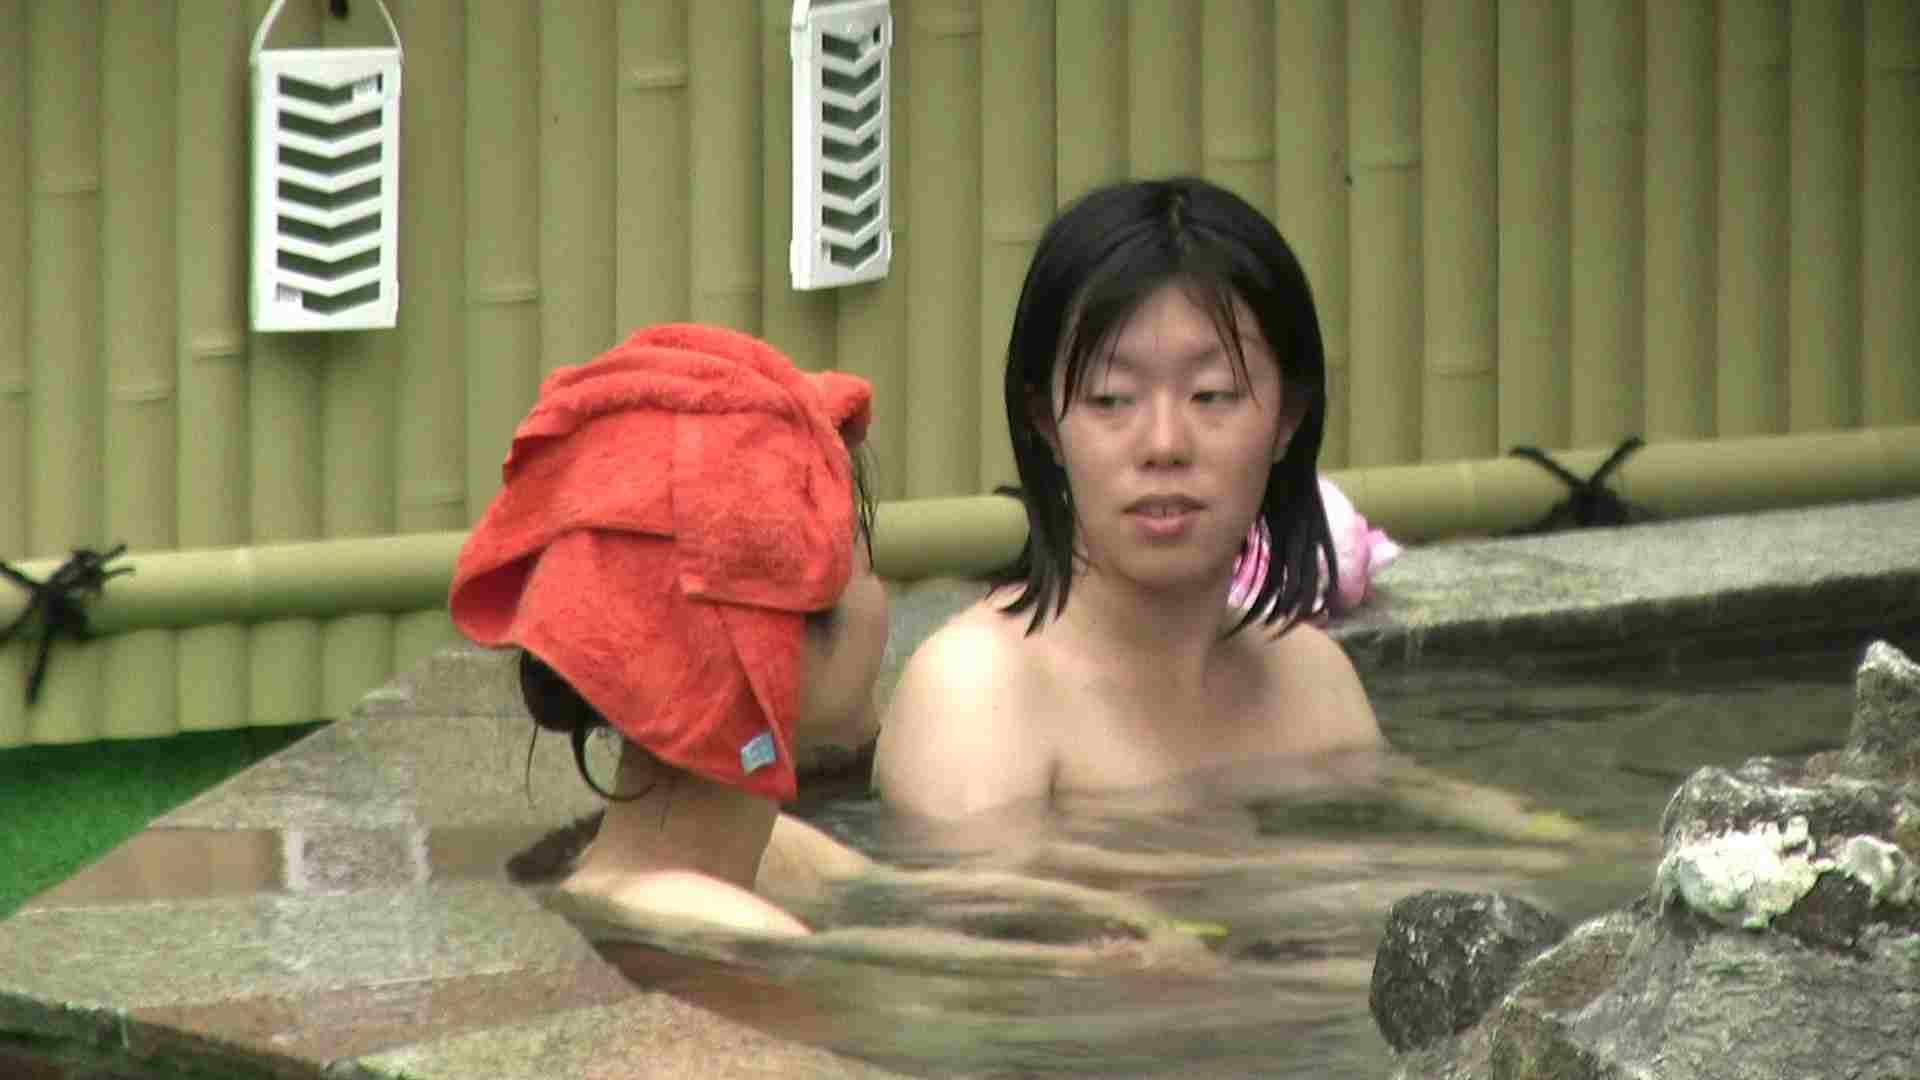 Aquaな露天風呂Vol.187 盗撮   HなOL  96pic 9